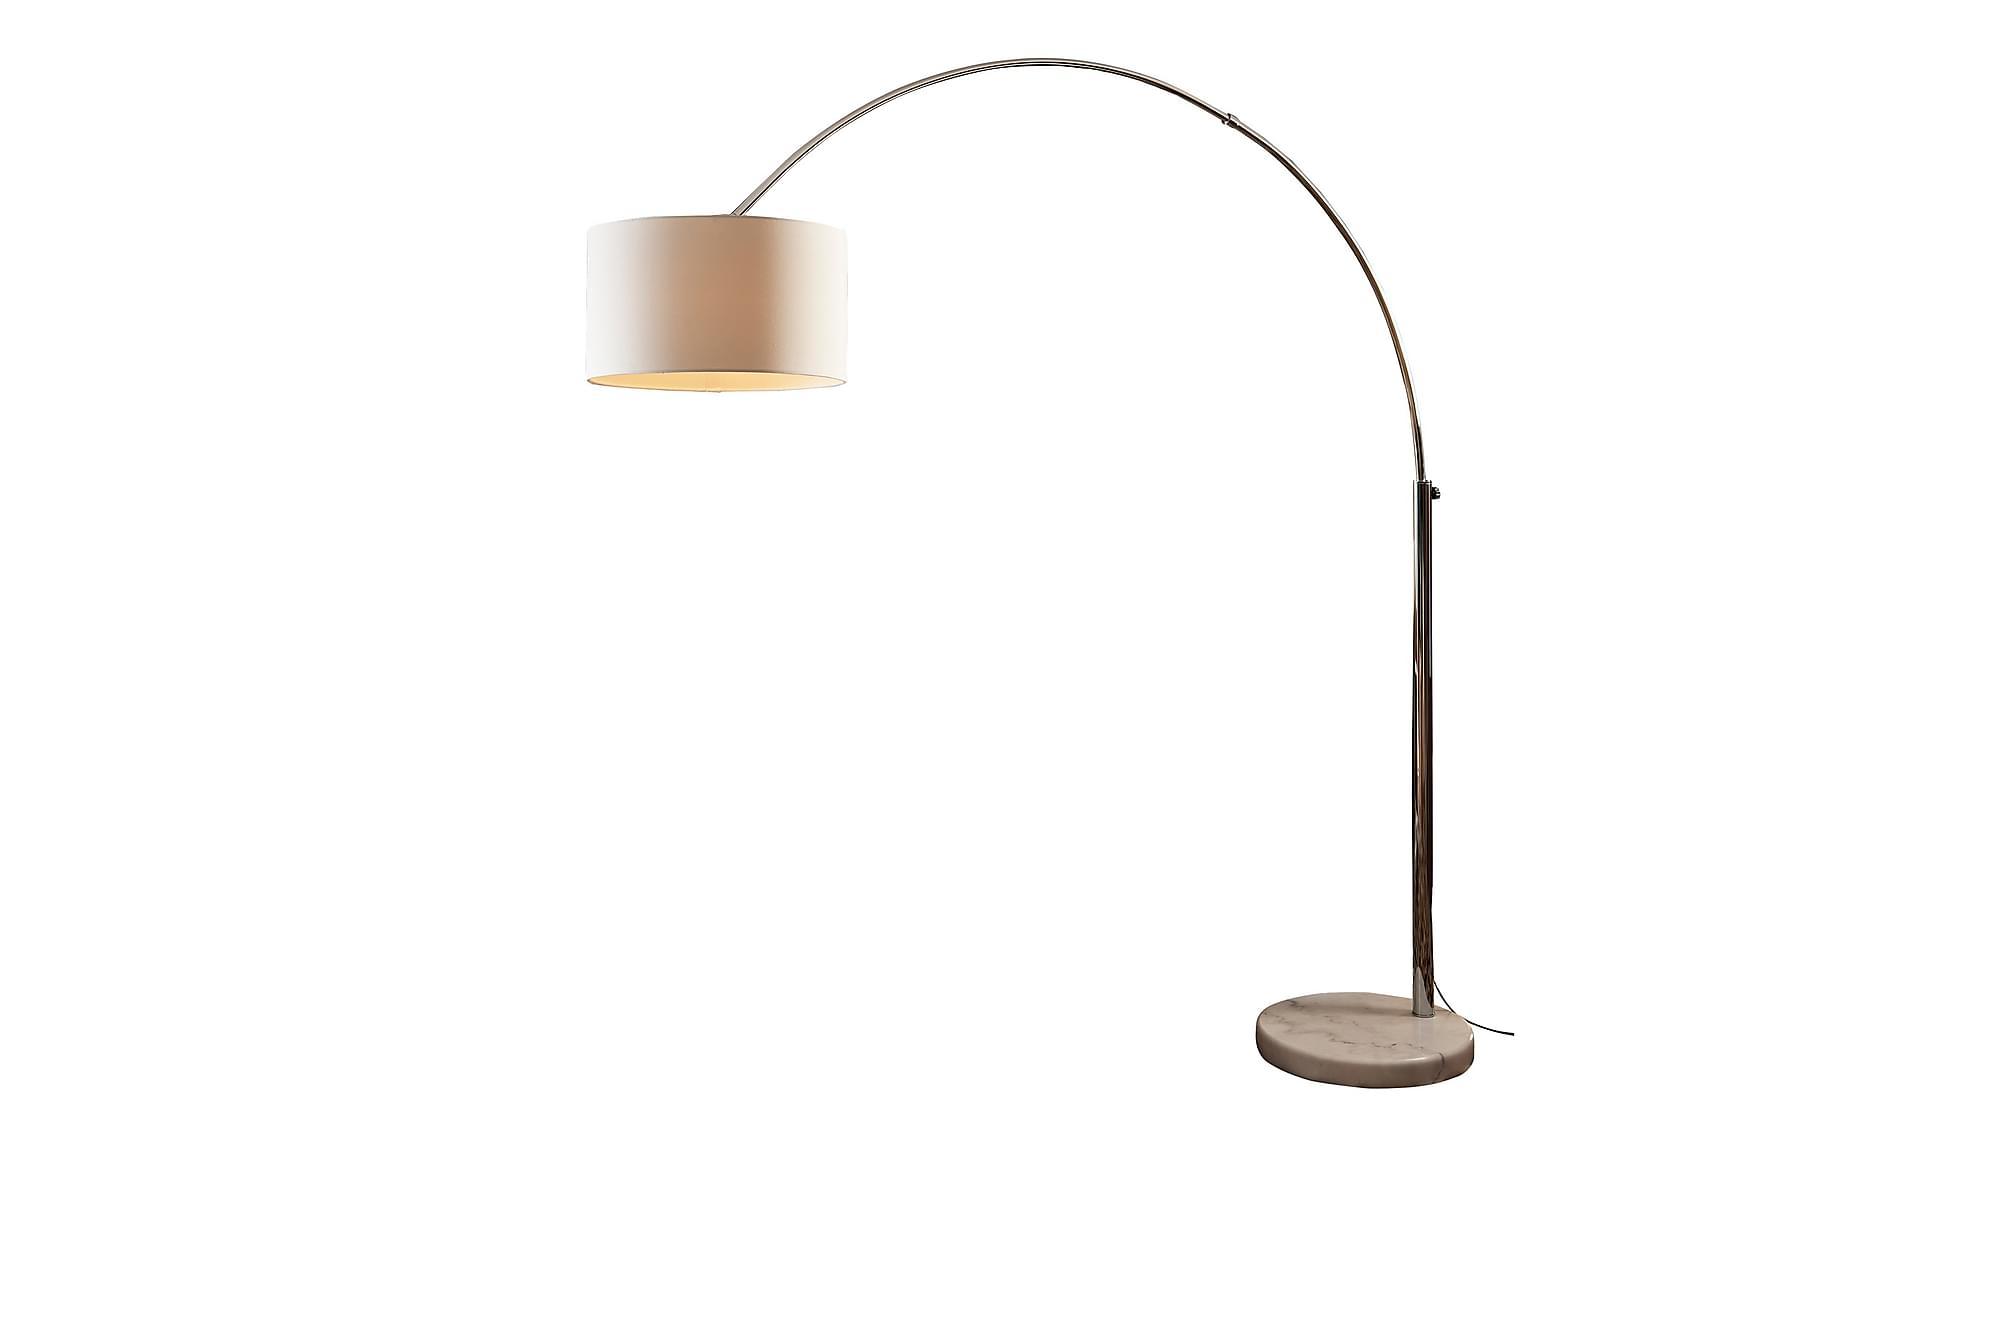 Båglampa 210 cm white, Golvlampor